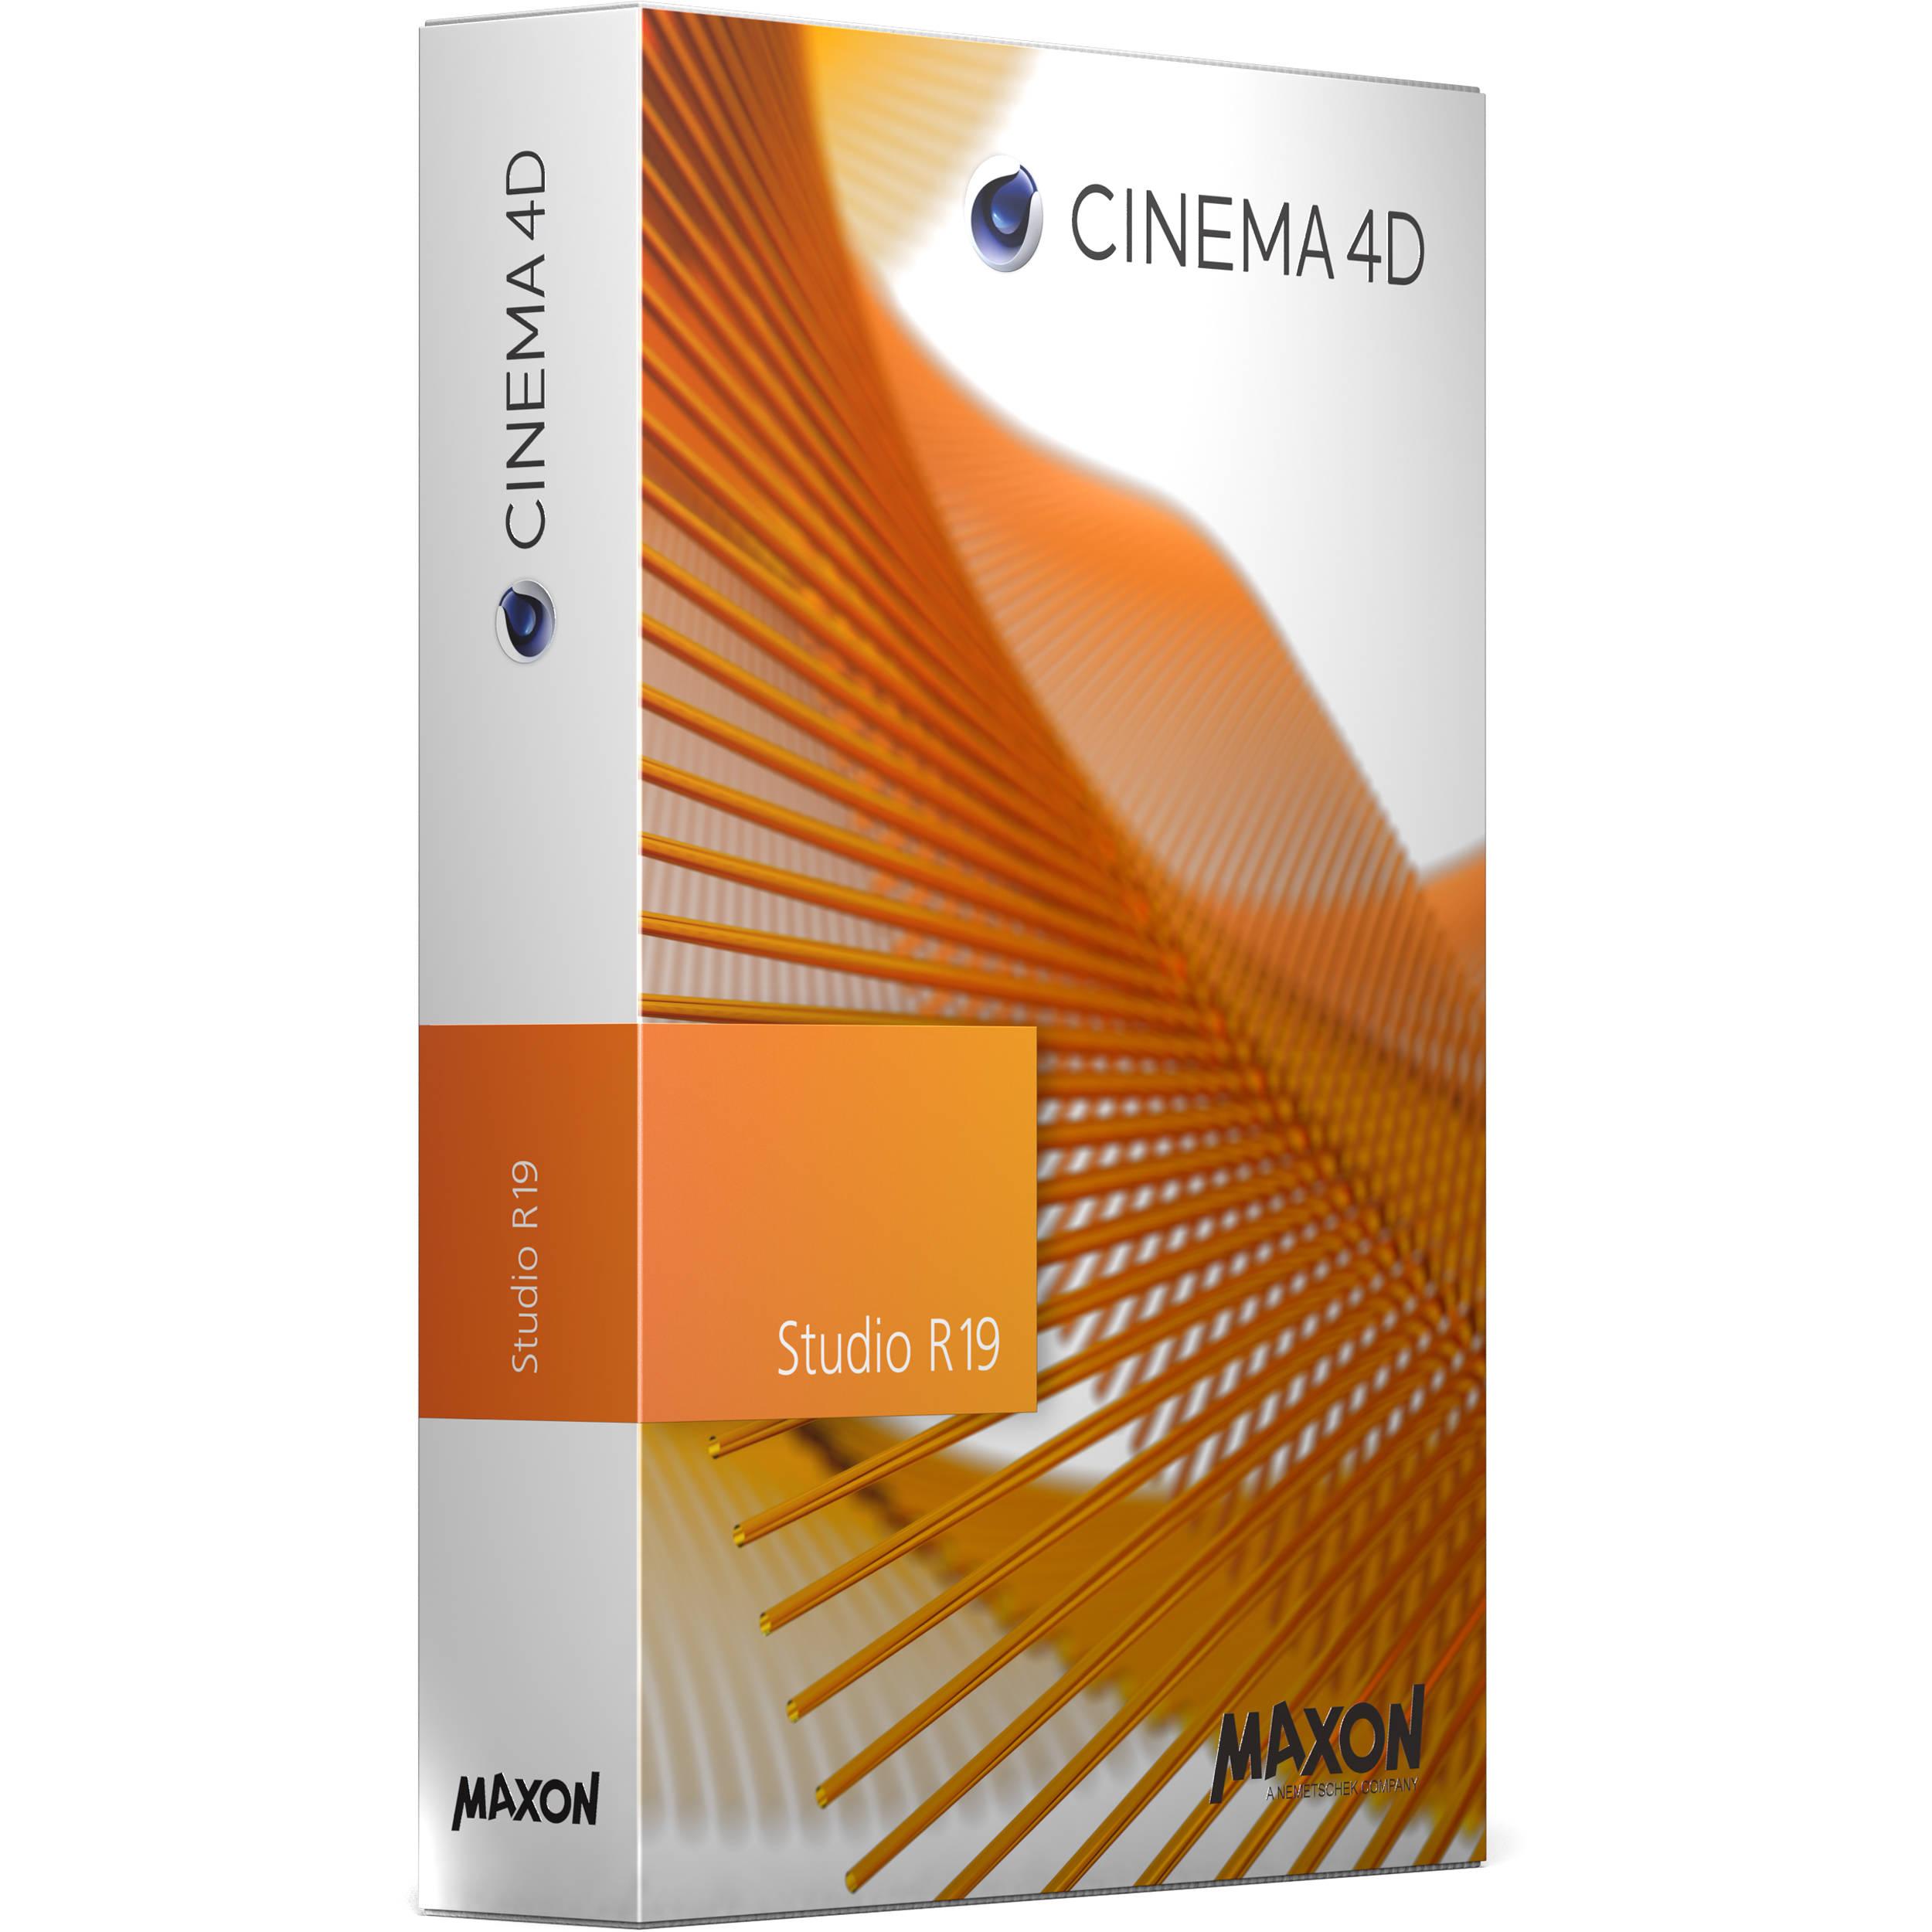 Maxon Cinema 4D Studio R19 (Upgrade from Prime R17, Download)